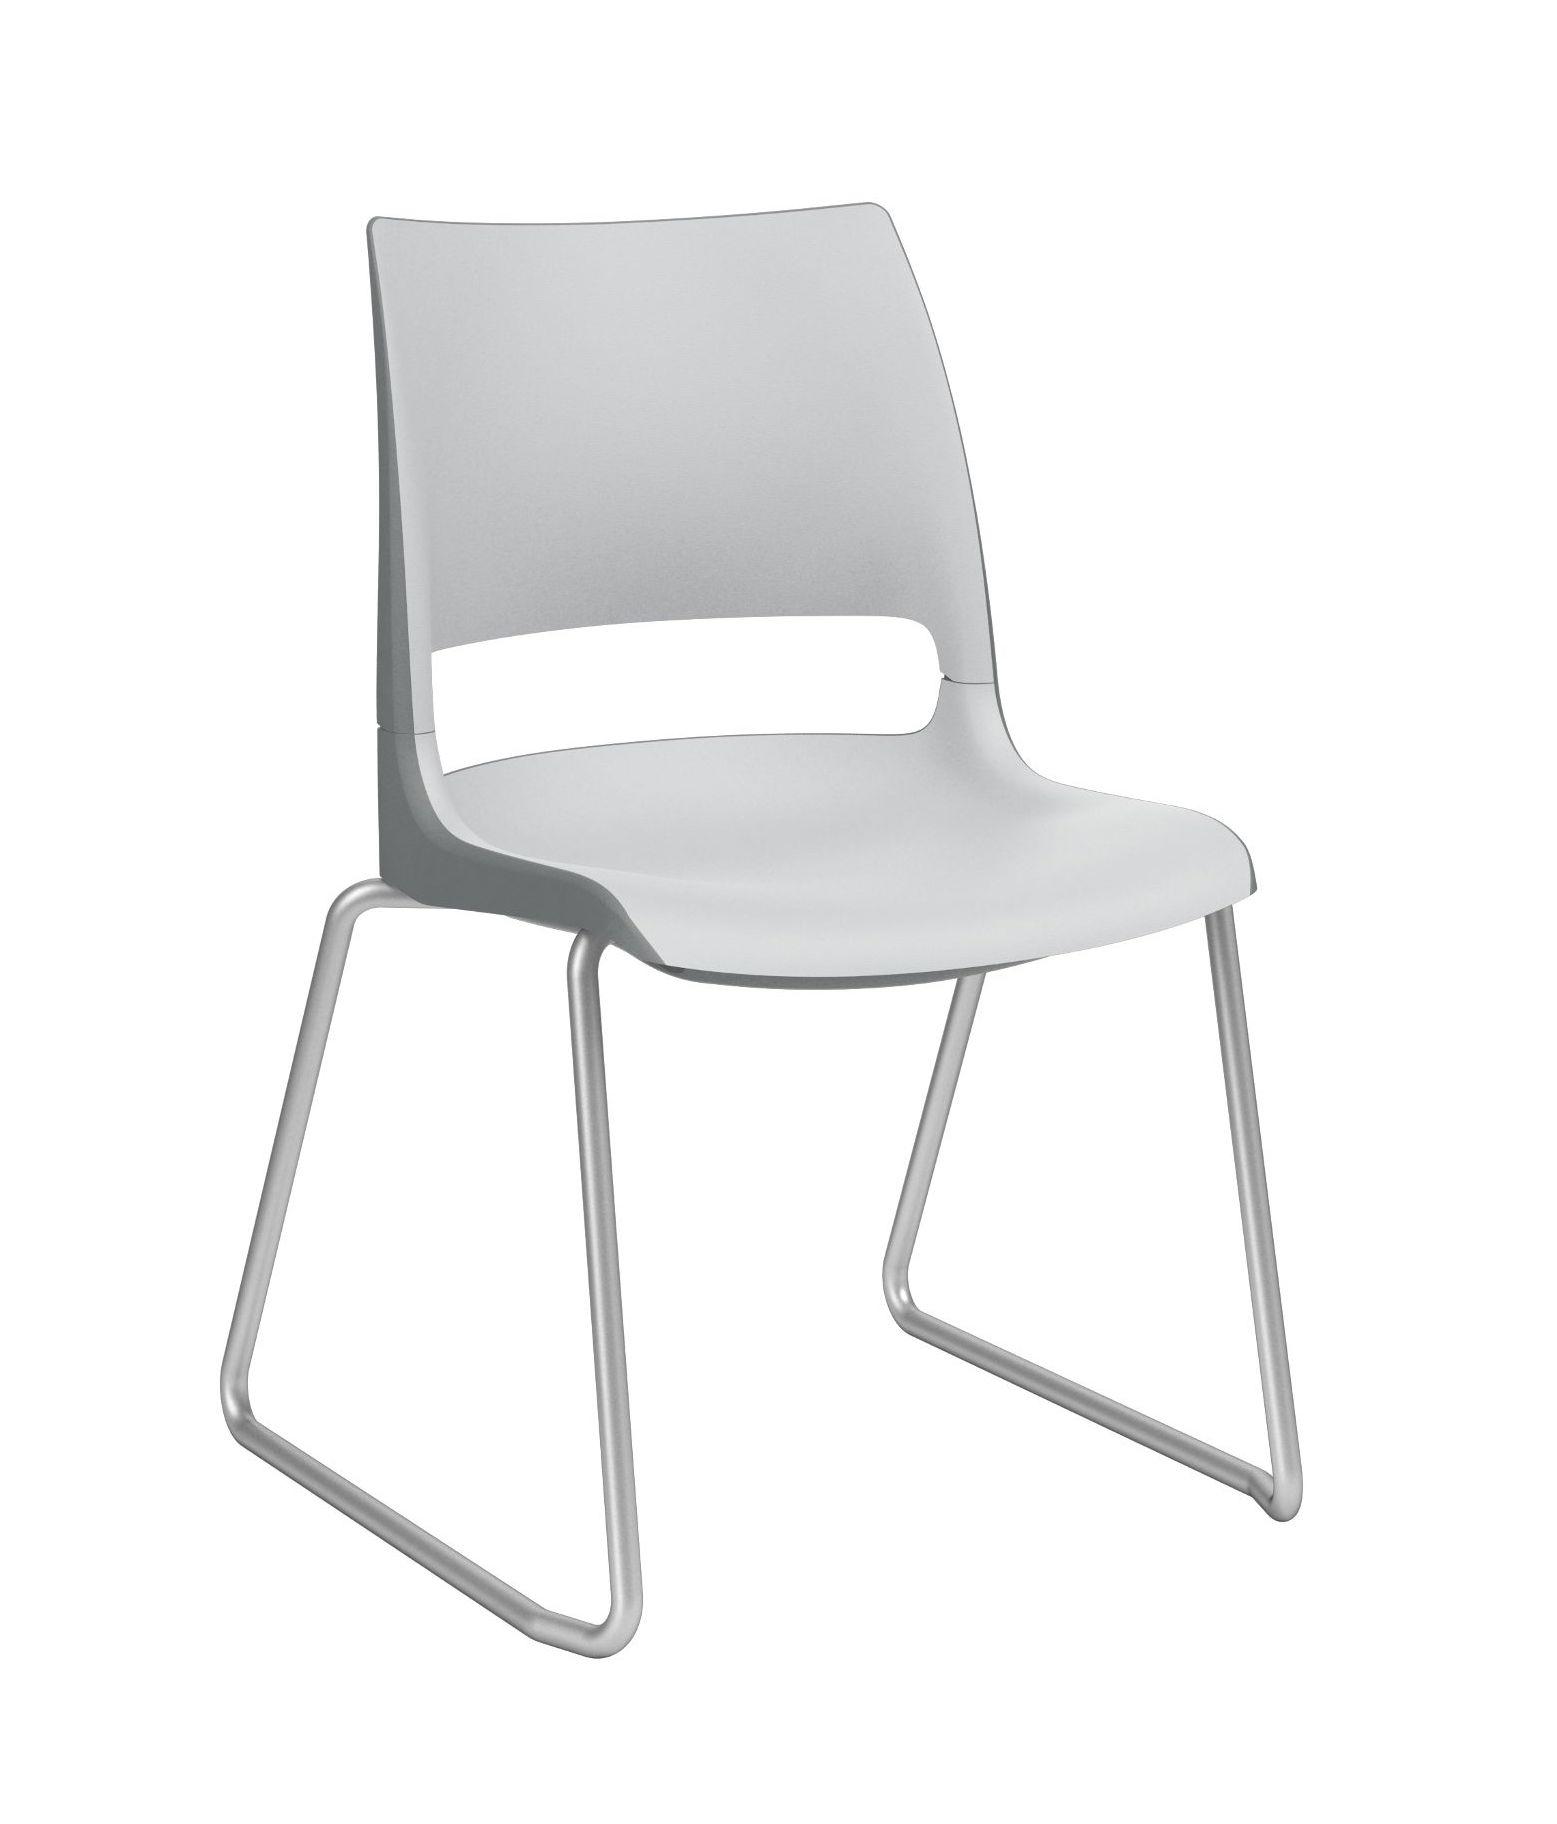 ki doni sled base stack chair dn3100